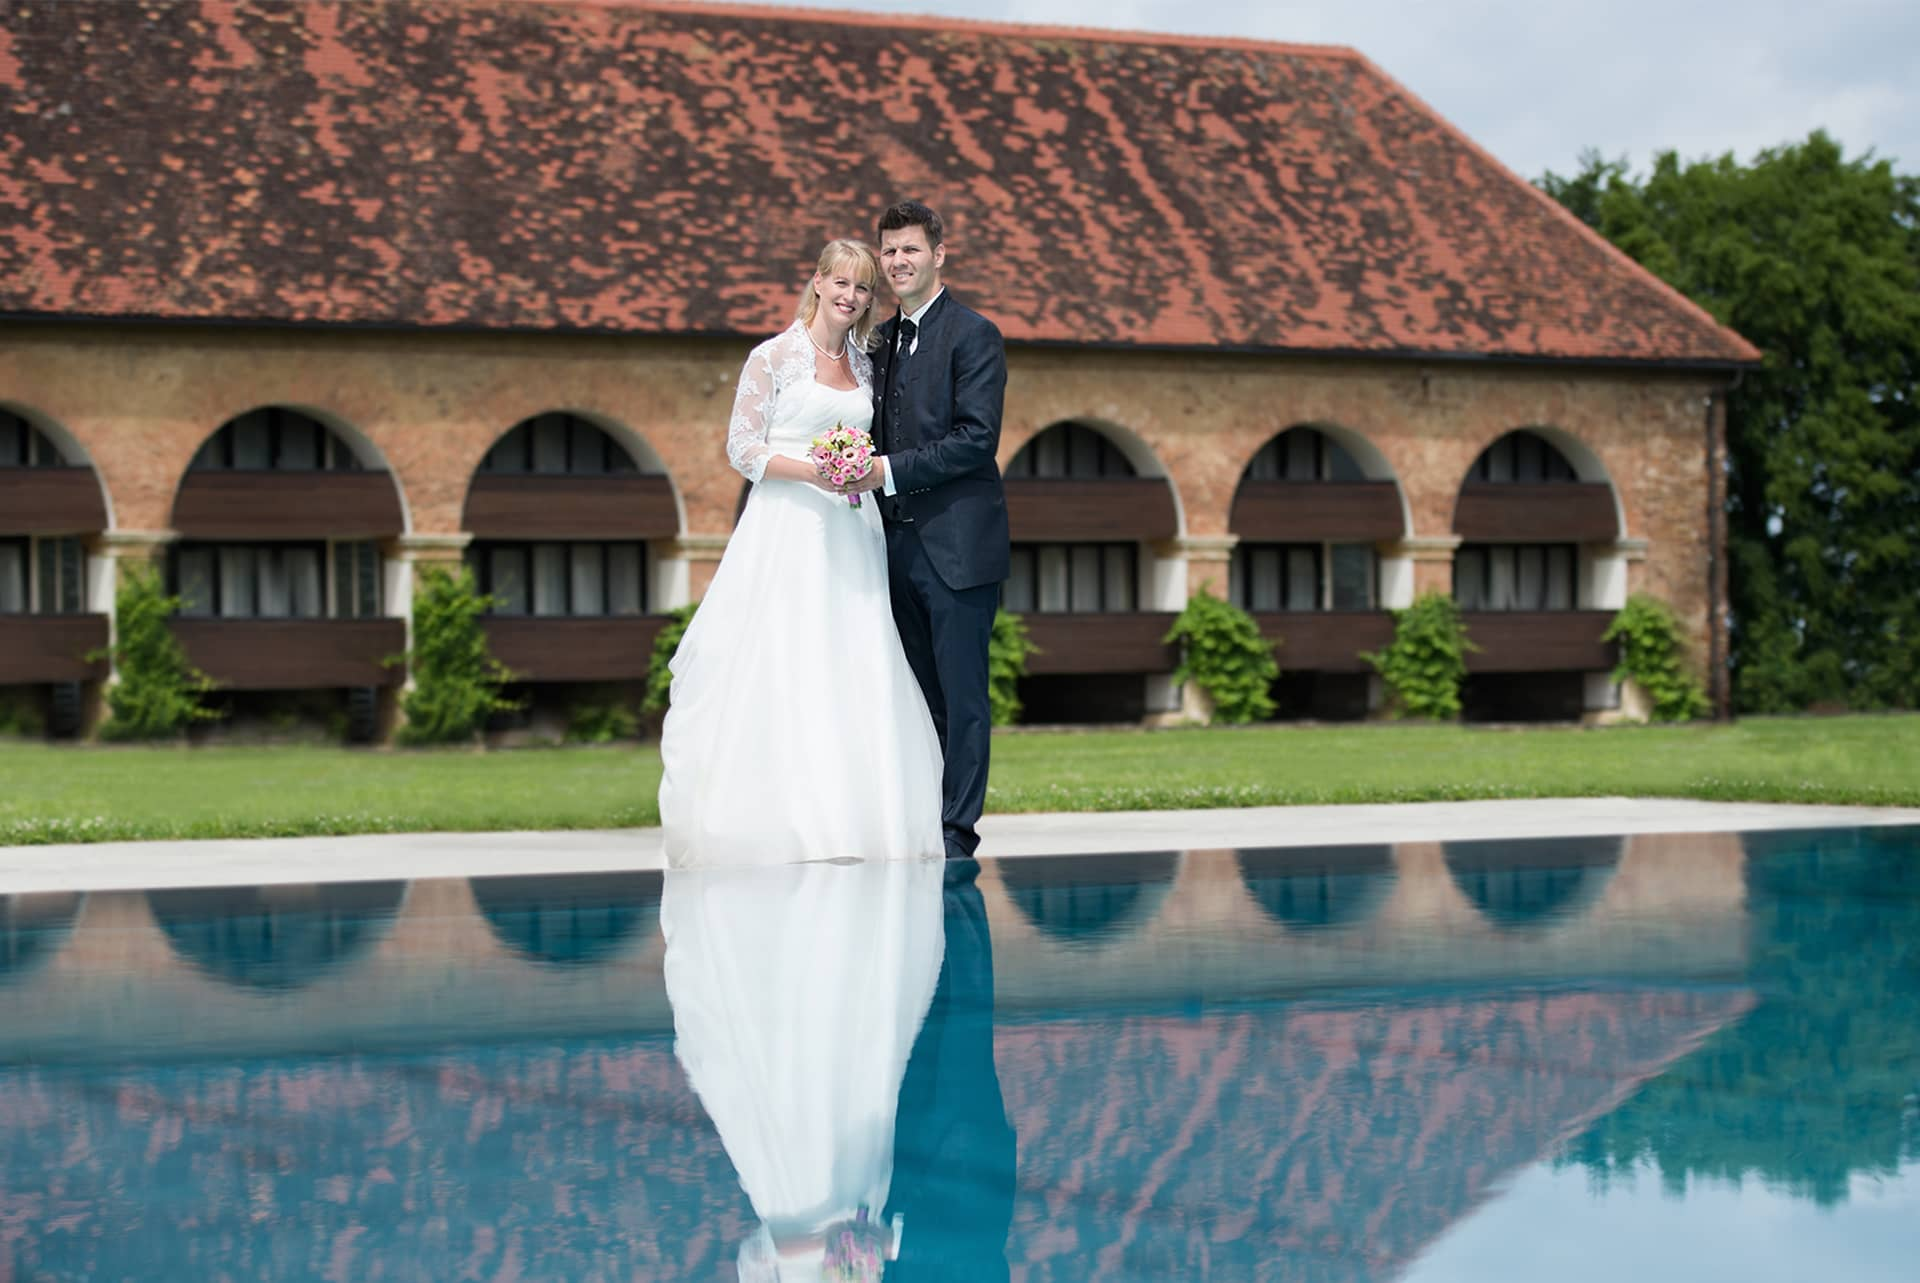 Hochzeitsfotograf Eibl